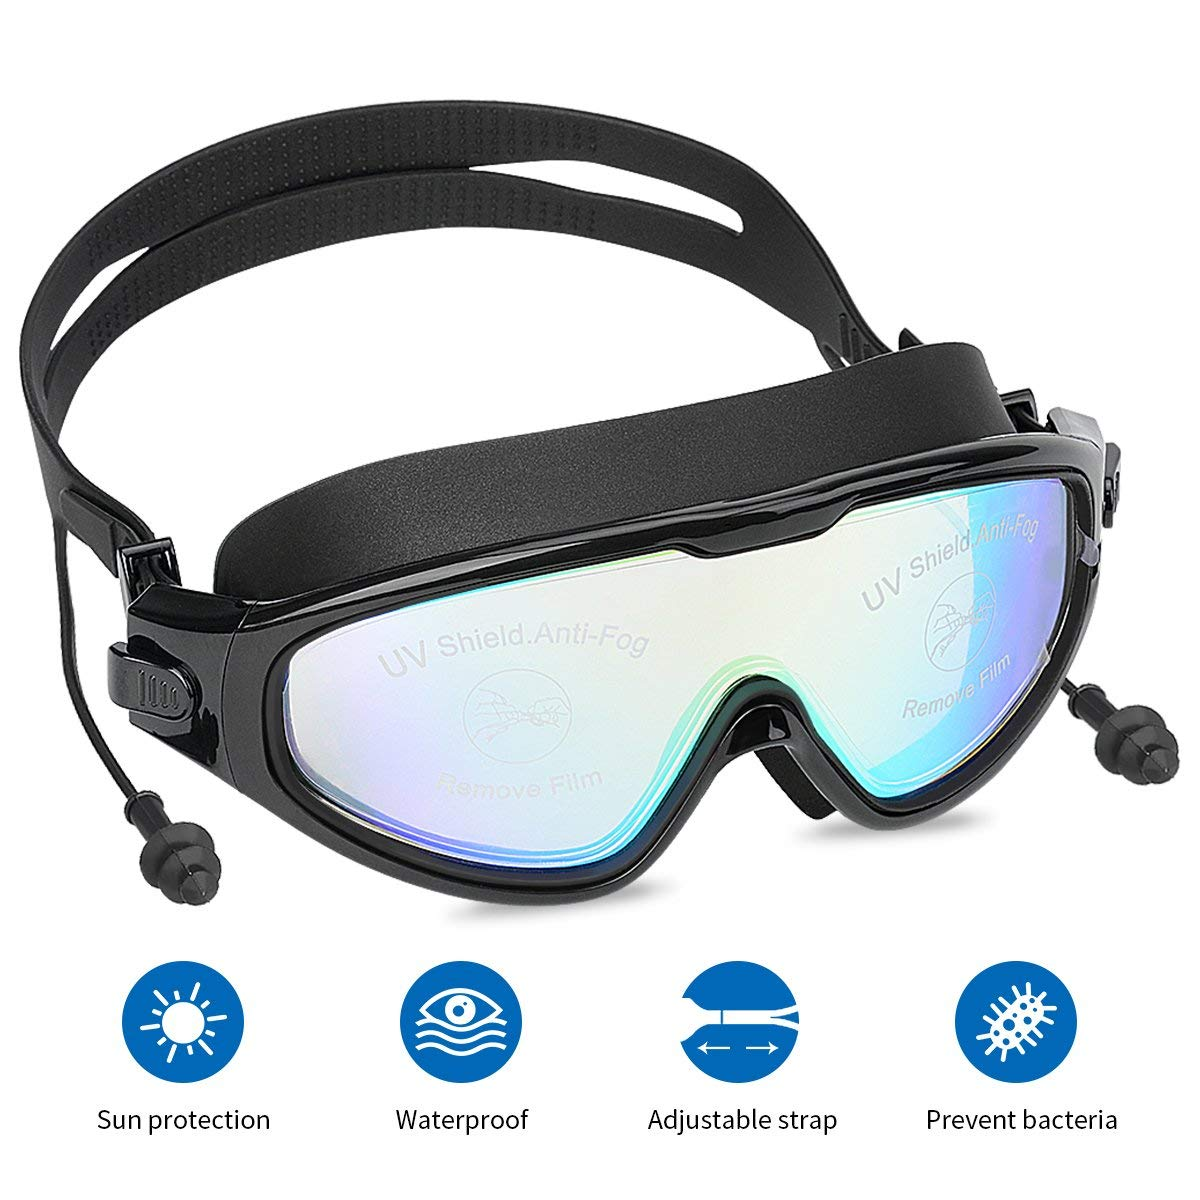 1b77dc802db2 Get Quotations · Mantispeed Swim Goggles